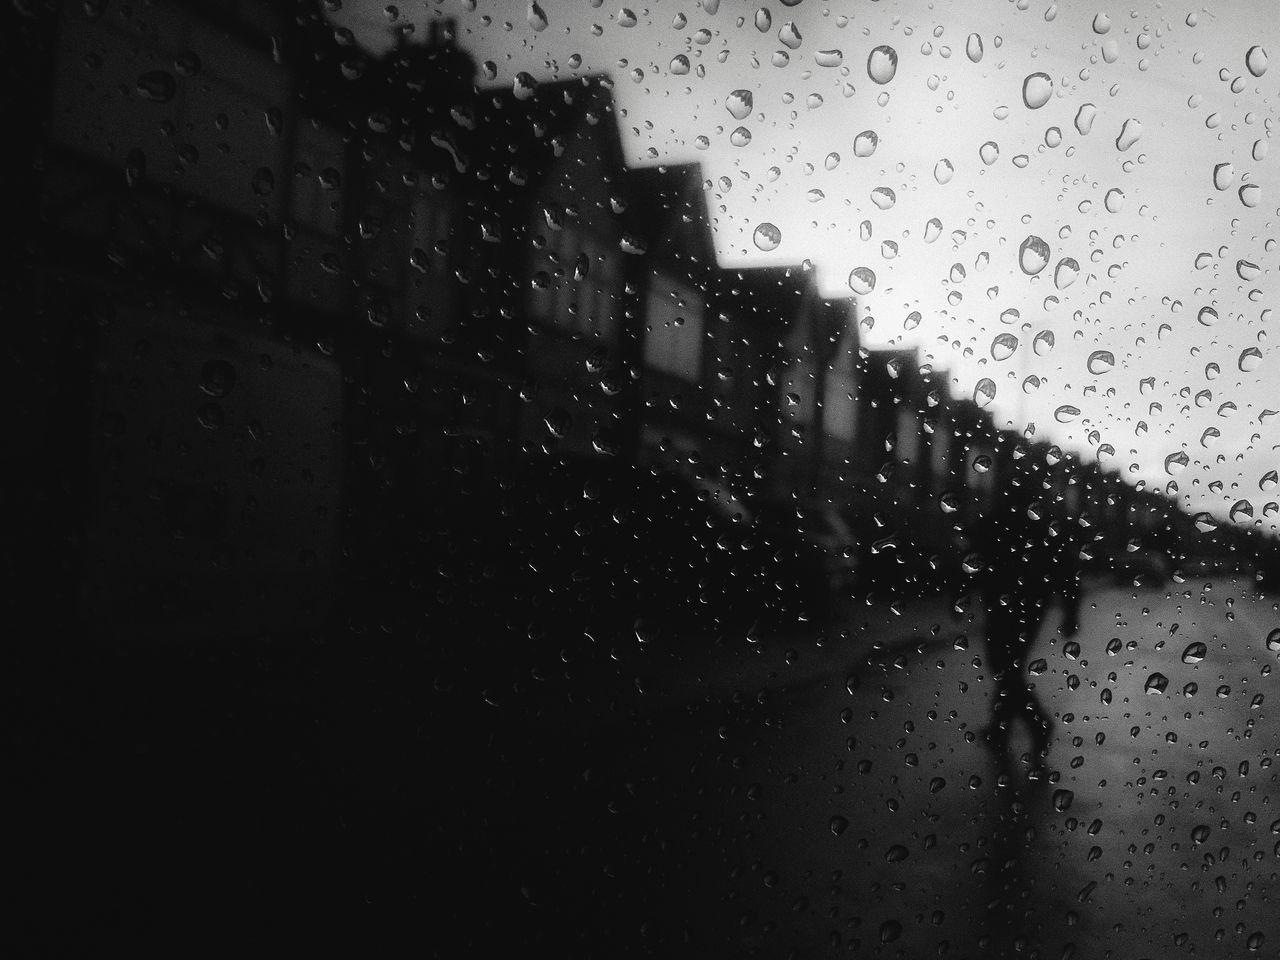 Wet Rain Drop Water Weather Rainy Season RainDrop Window Car EyeEm Best Shots The Week Of Eyeem Fresh On Eyeem  Architecture Droplet Day Close-up Outdoors Sky